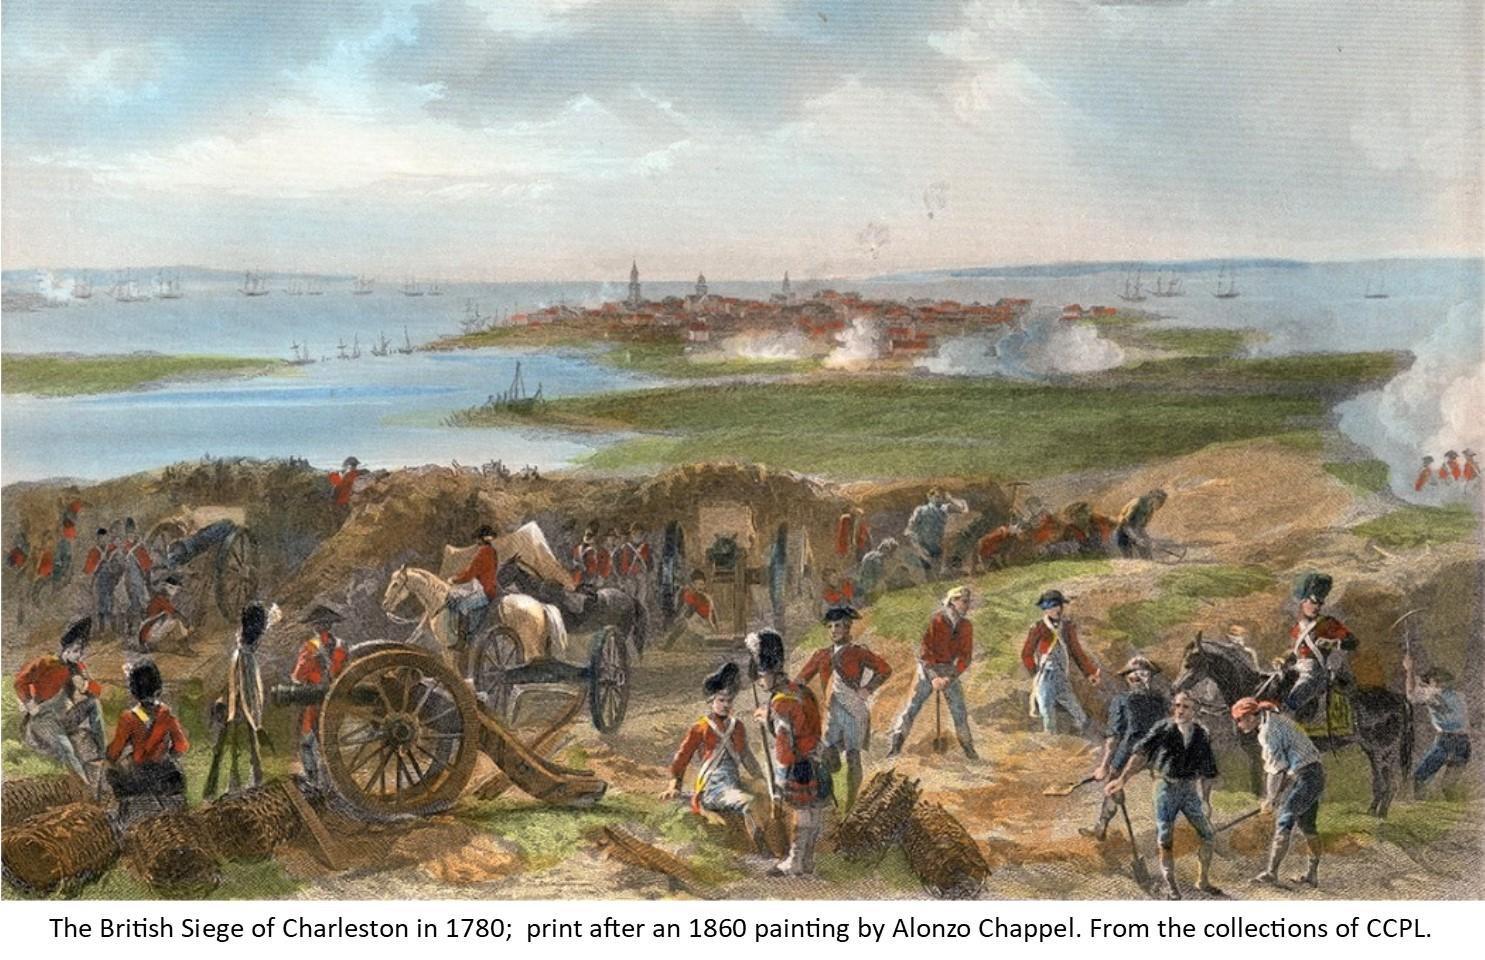 Charleston's Victory Day, Part 1